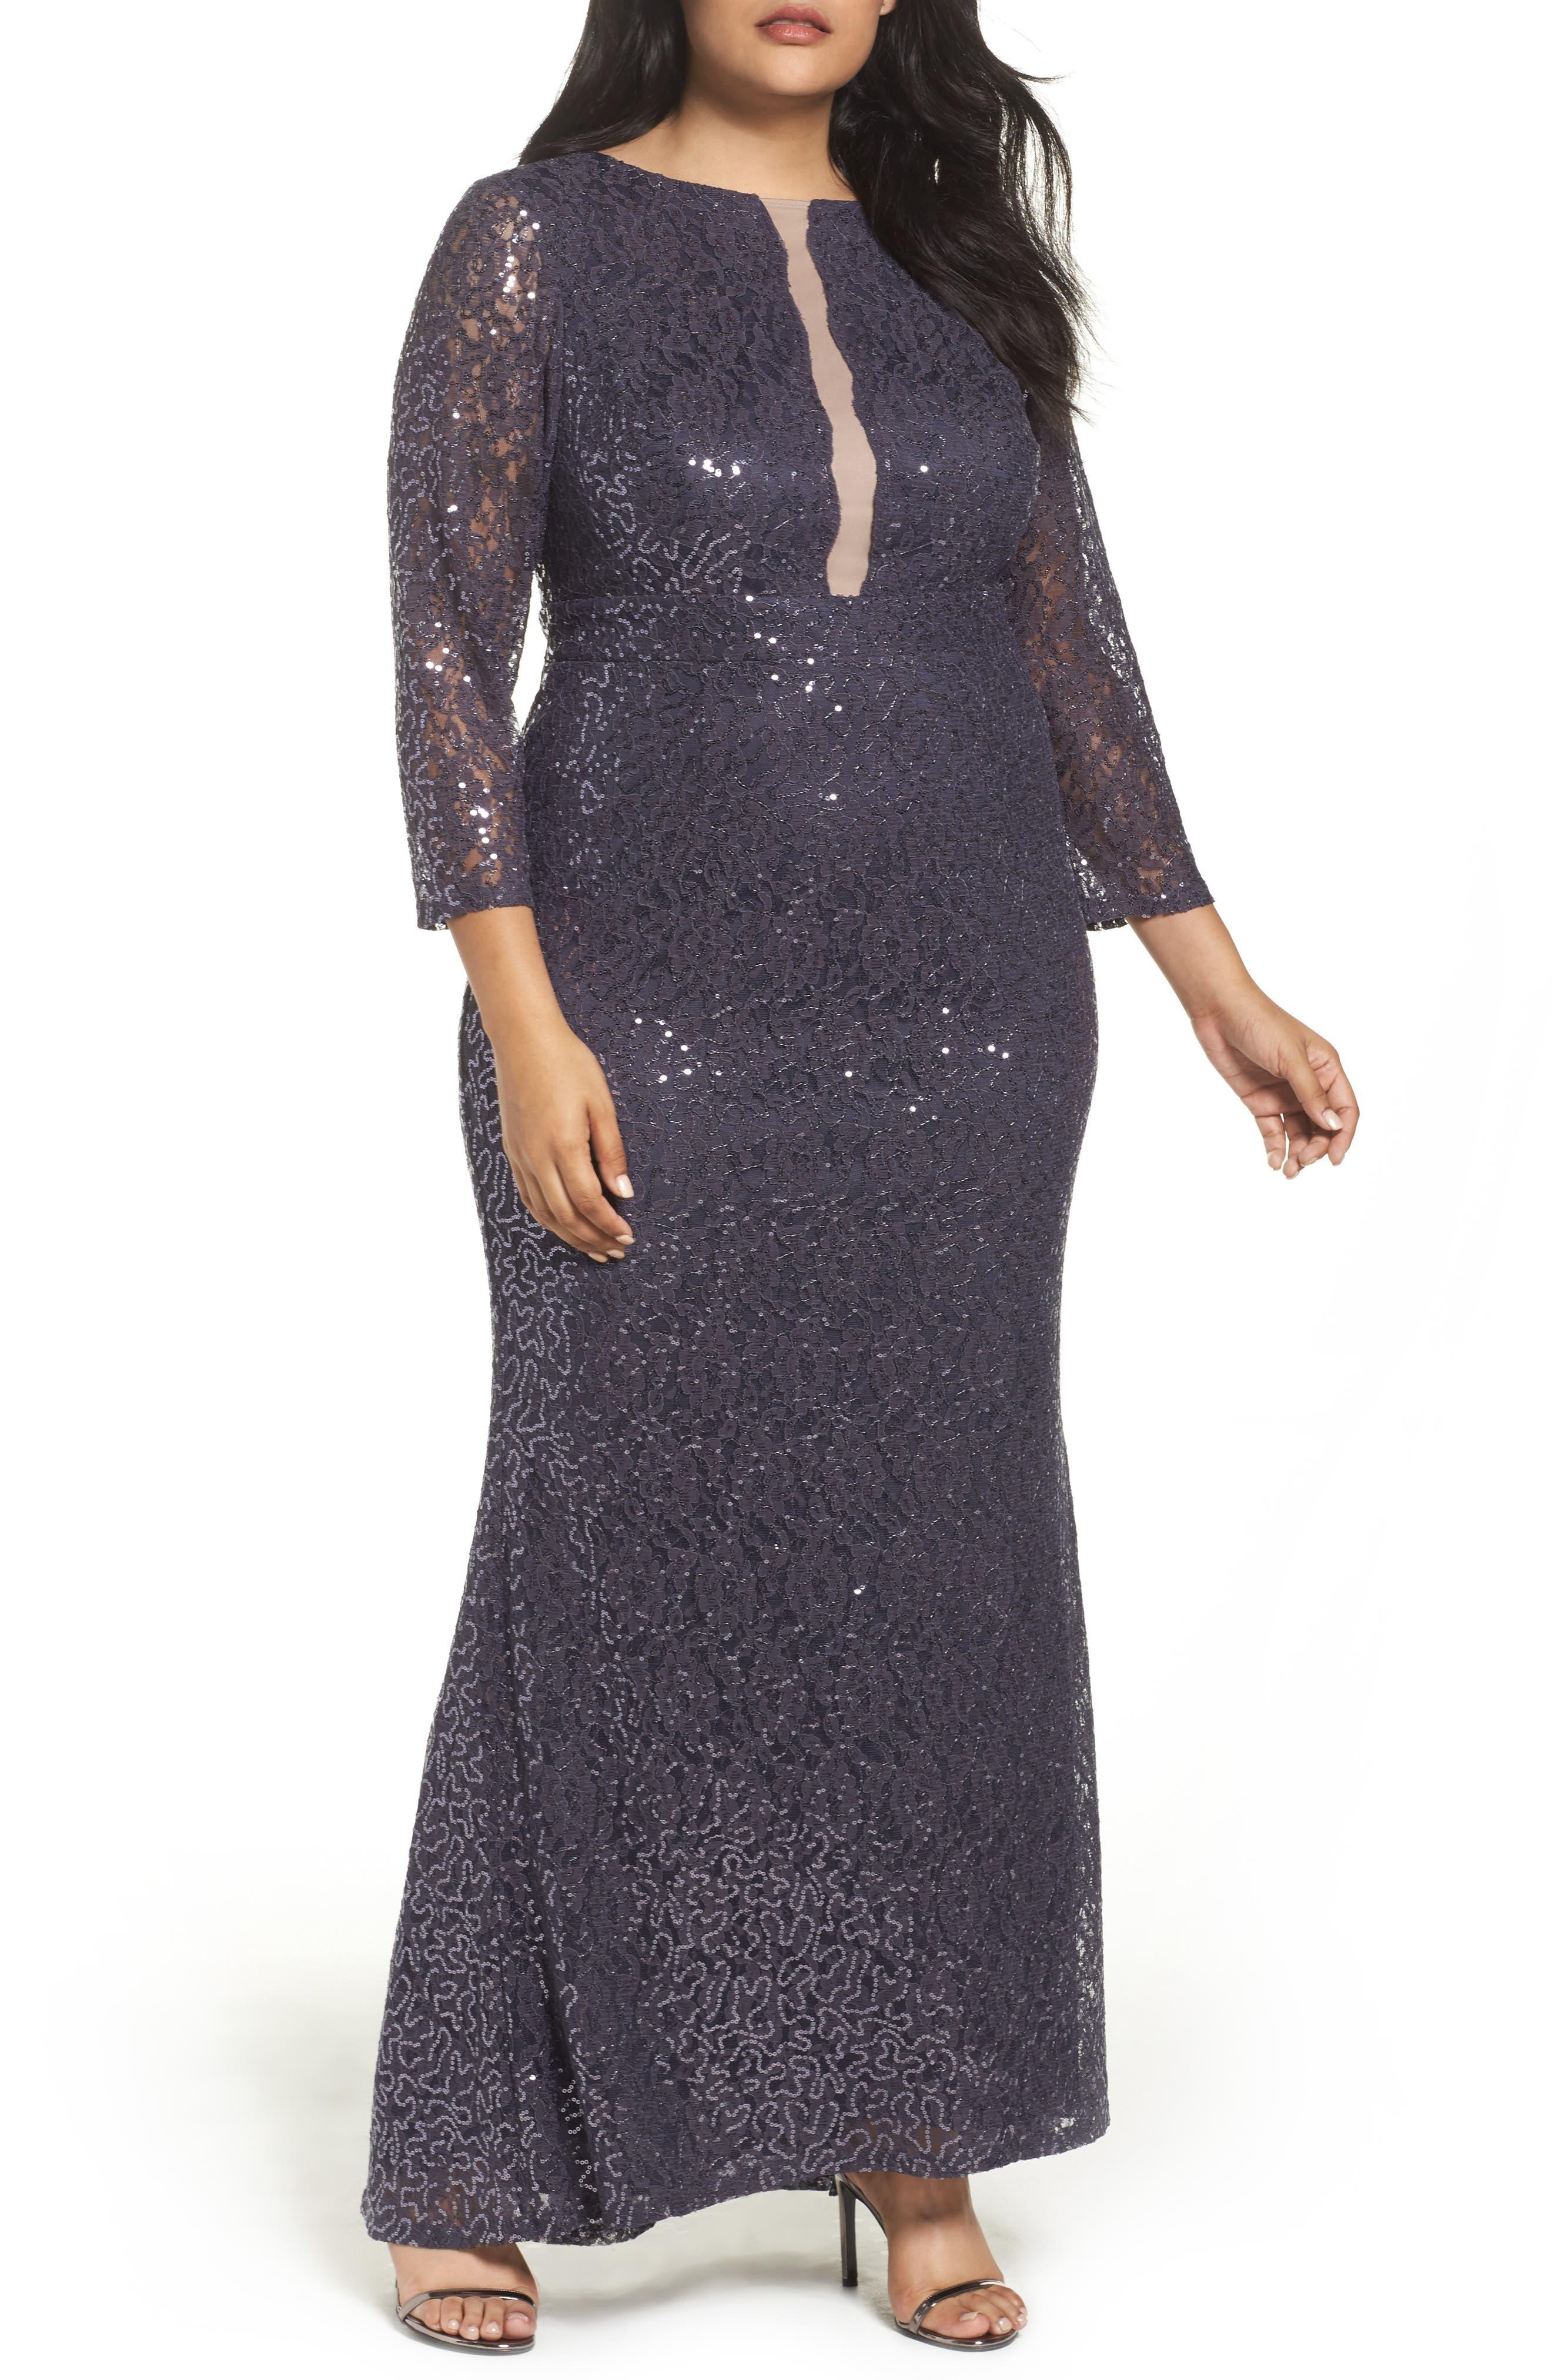 MARINA, Sequin Lace A-Line Gown, Main thumbnail 1, color, 069